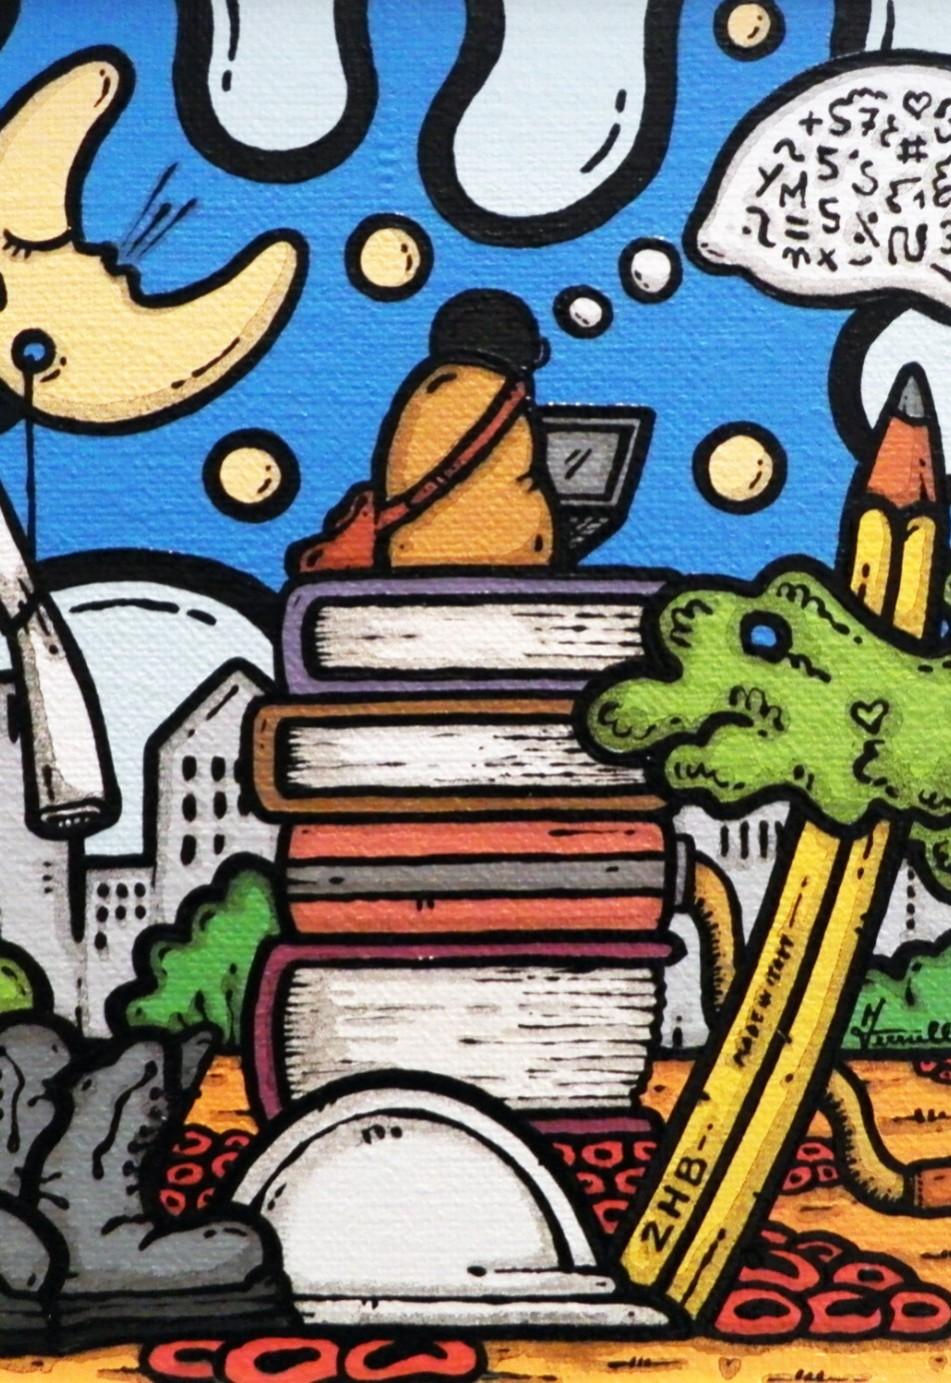 opera, contornismo metafisico, francesco ferrulli, pittore pugliese, artista italiano, arte contemporanea, dipinto, olio su tela, paesaggi pugliesi, puglia, quadro colorato, equilibri d'ingegno, oil on canvas, art, painter,